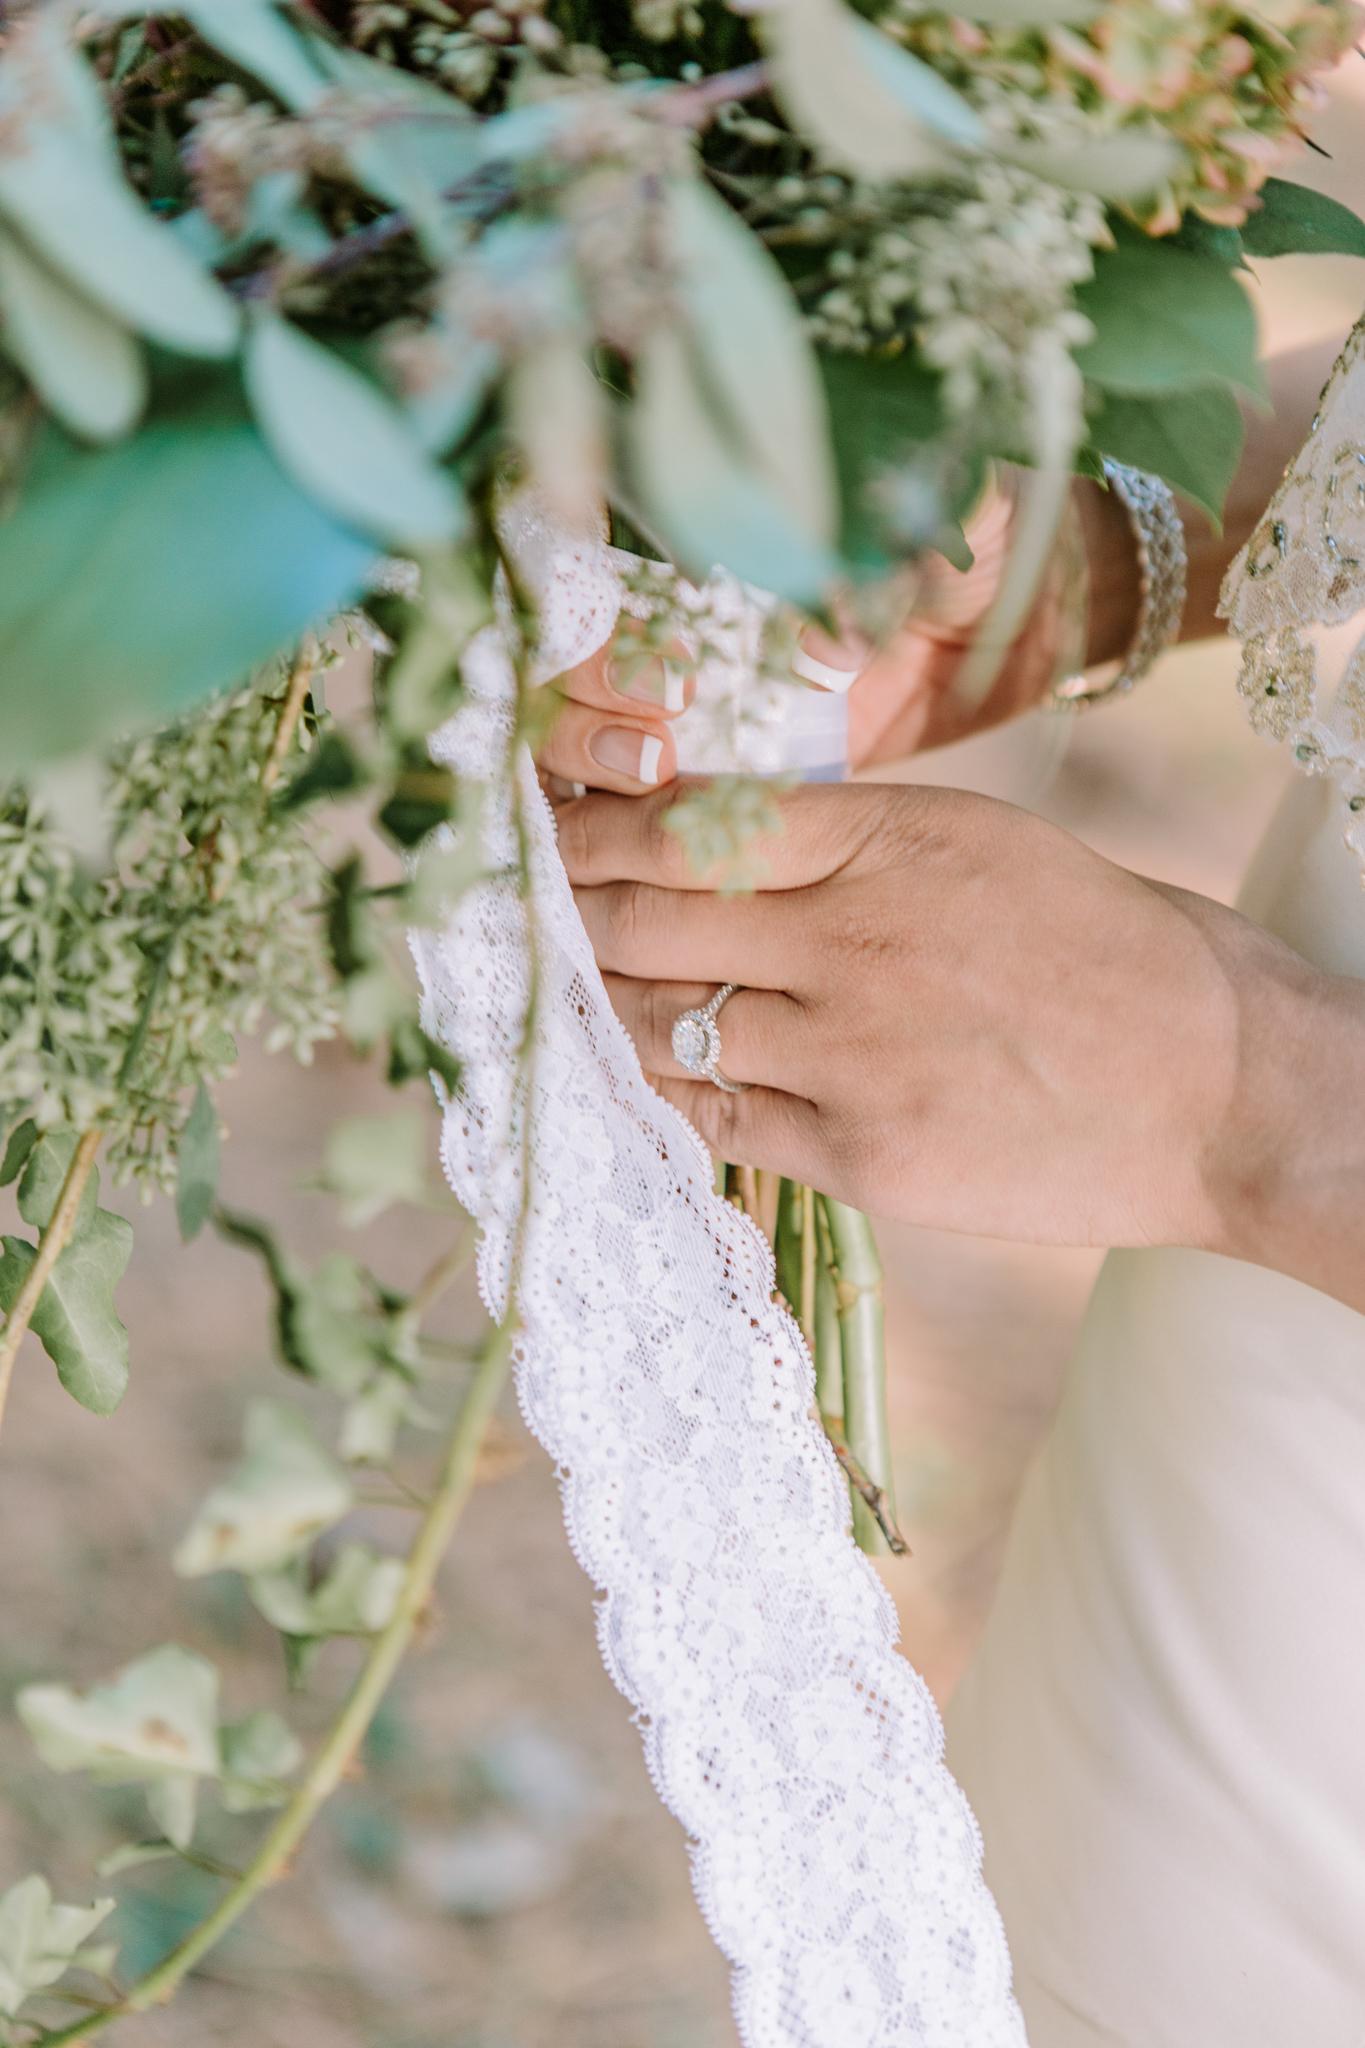 Richmond Kentucky Wedding Photographer - Ariana Jordan Photography -12.jpg